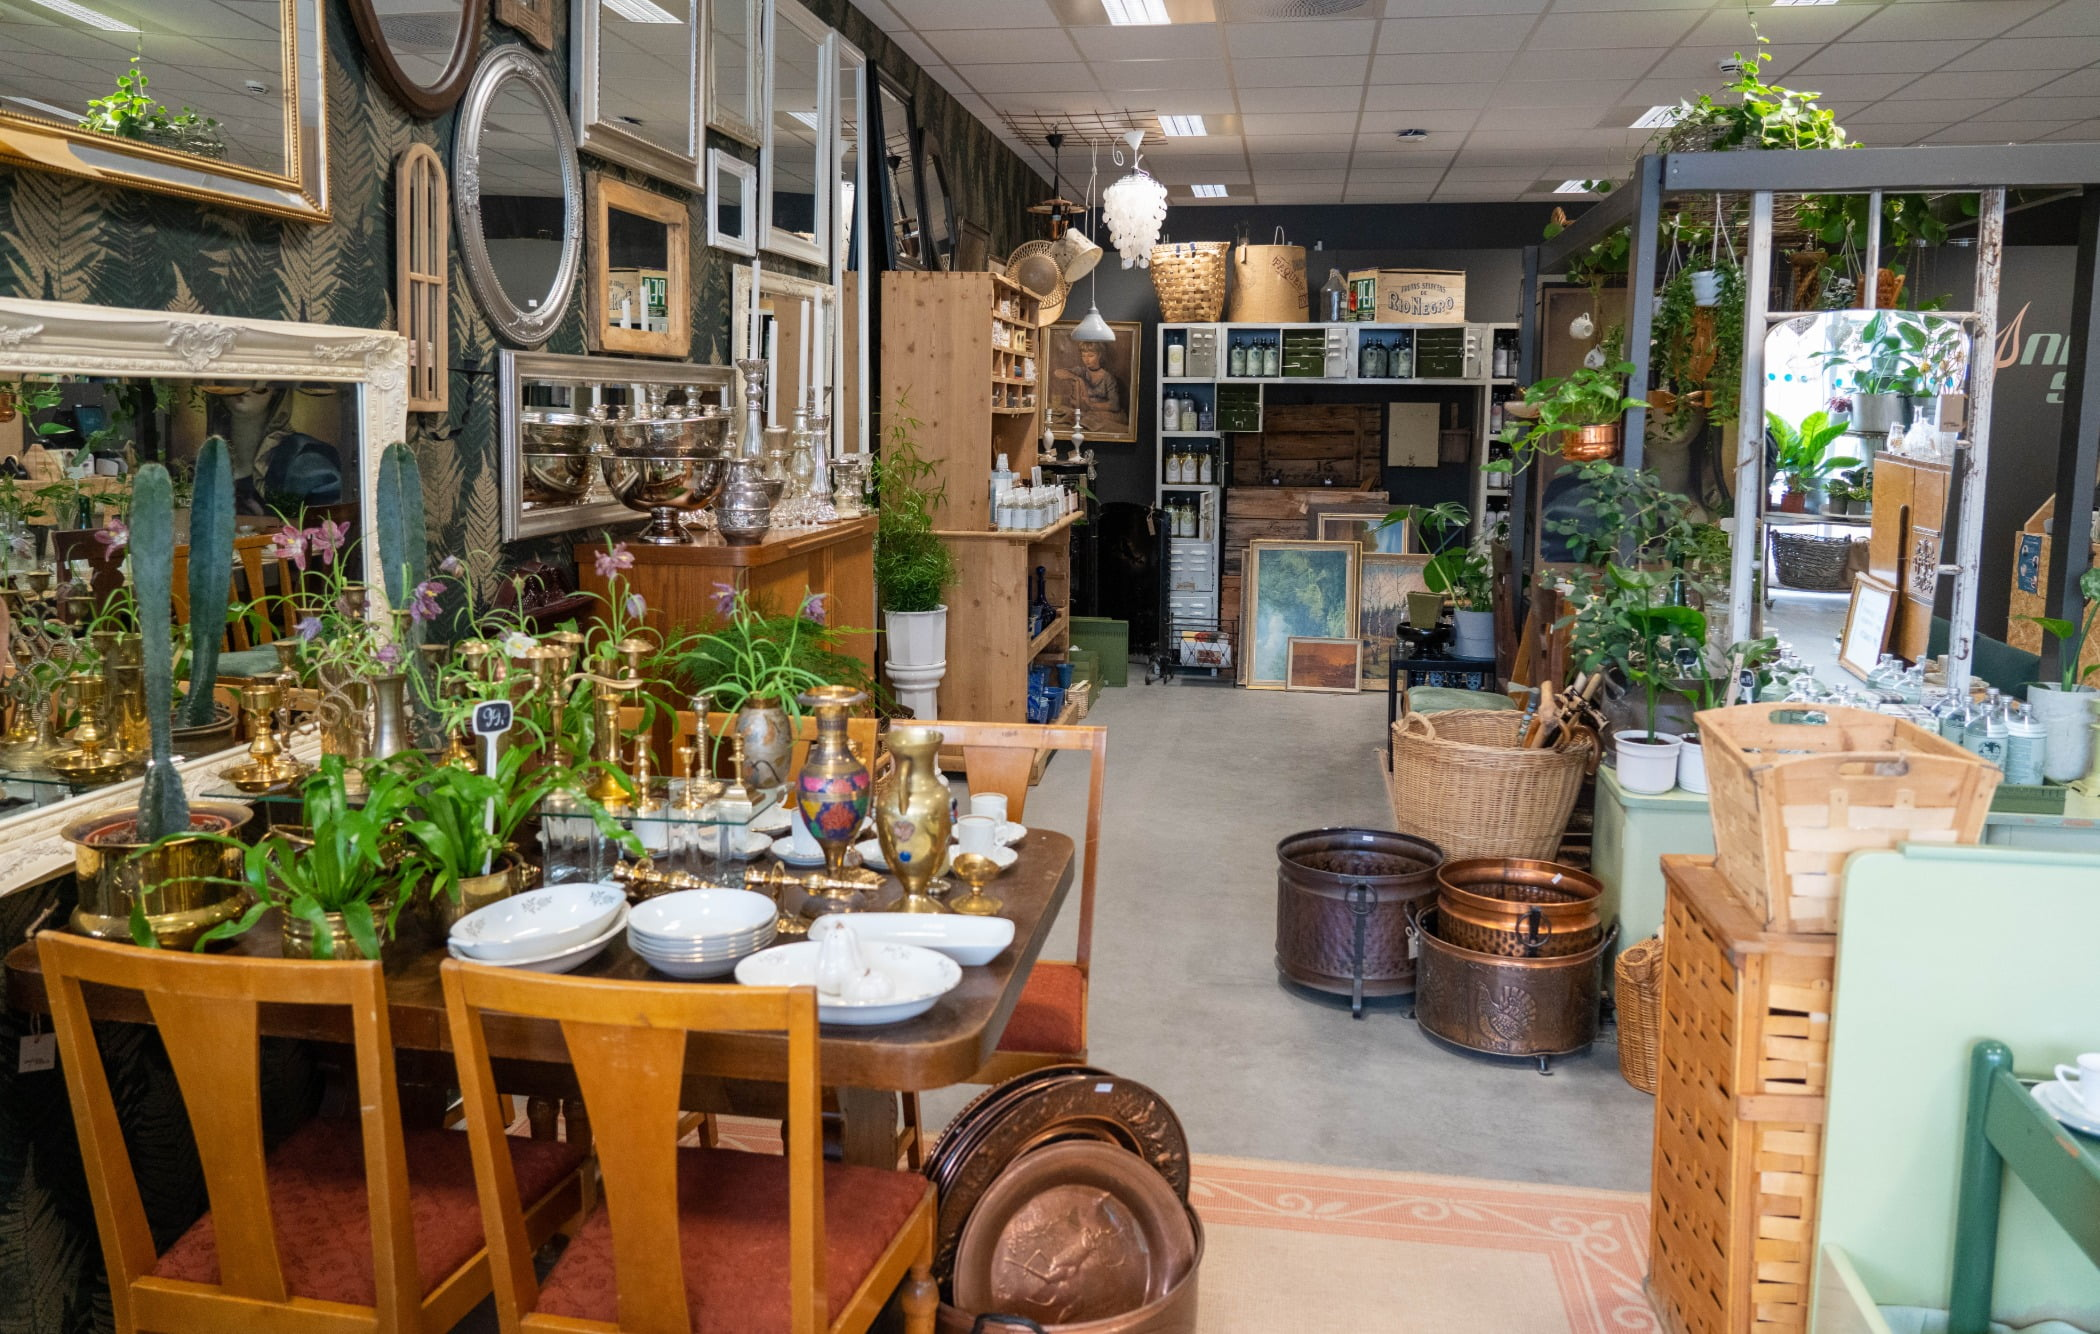 Interior design, Plant, Table, Flowerpot, Building, Tableware, Houseplant, Wood